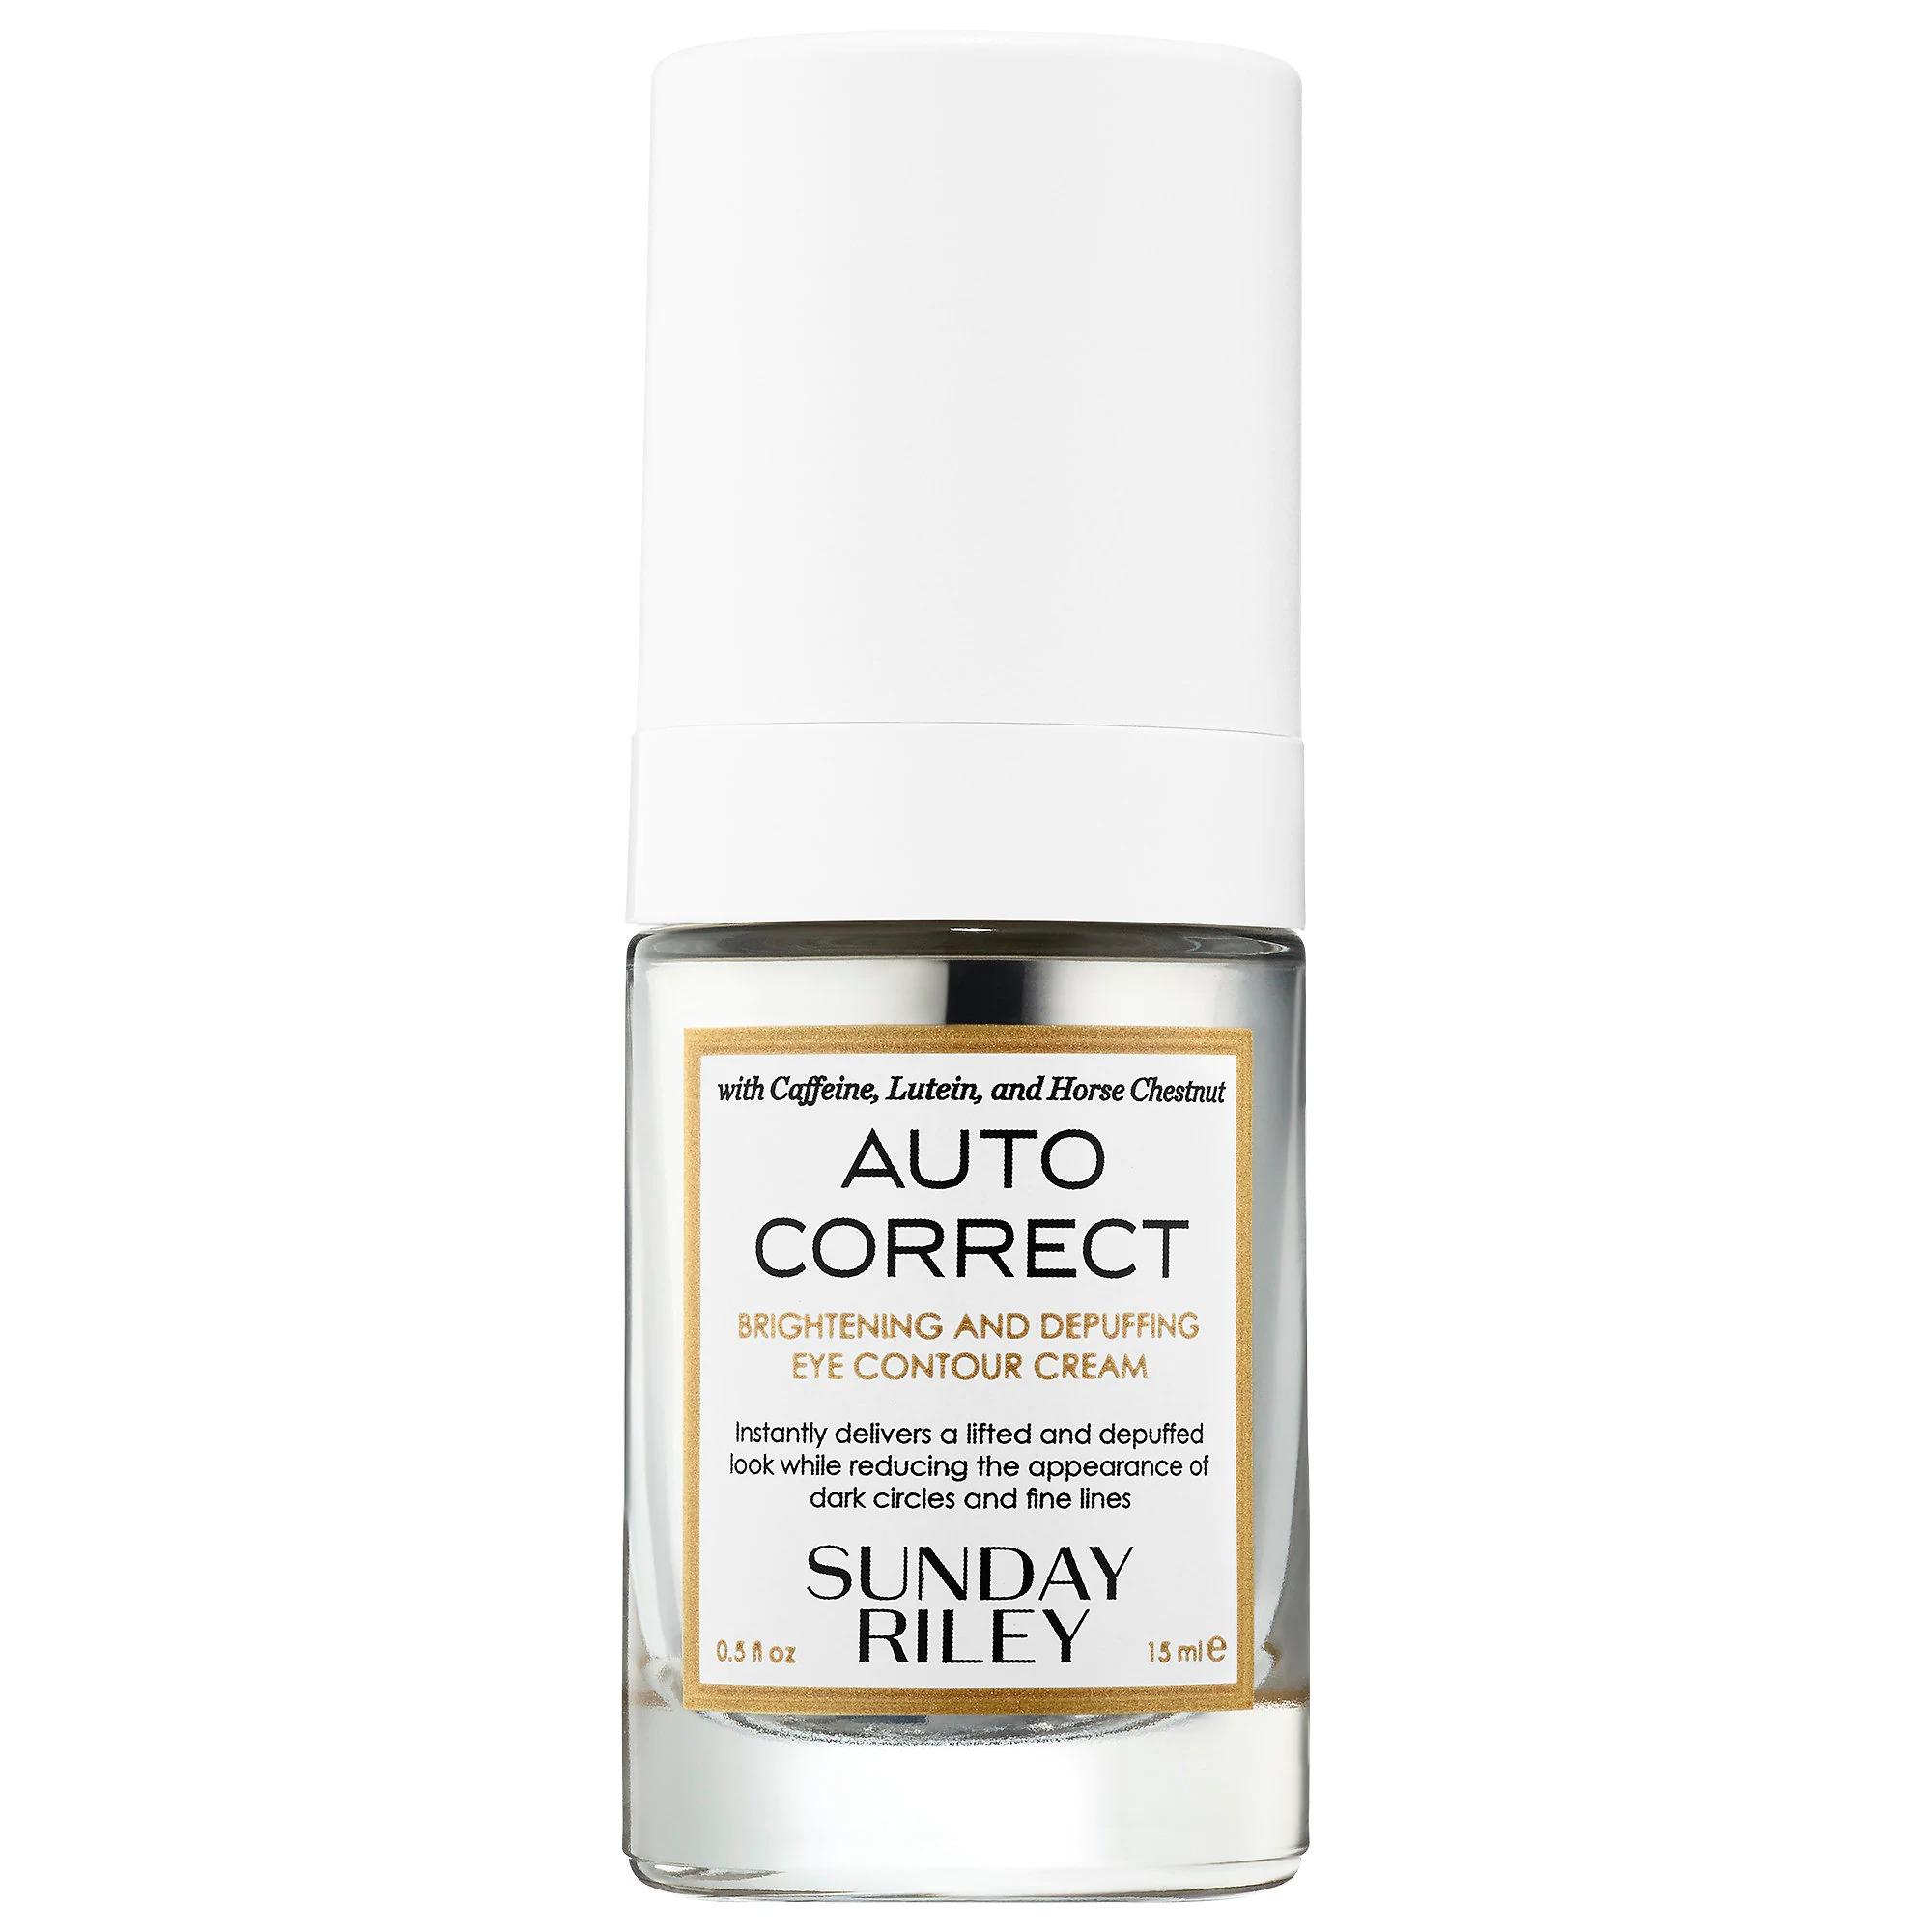 SUNDAY RILEY Auto Correct Brightening and Depuffing Eye Contour Cream